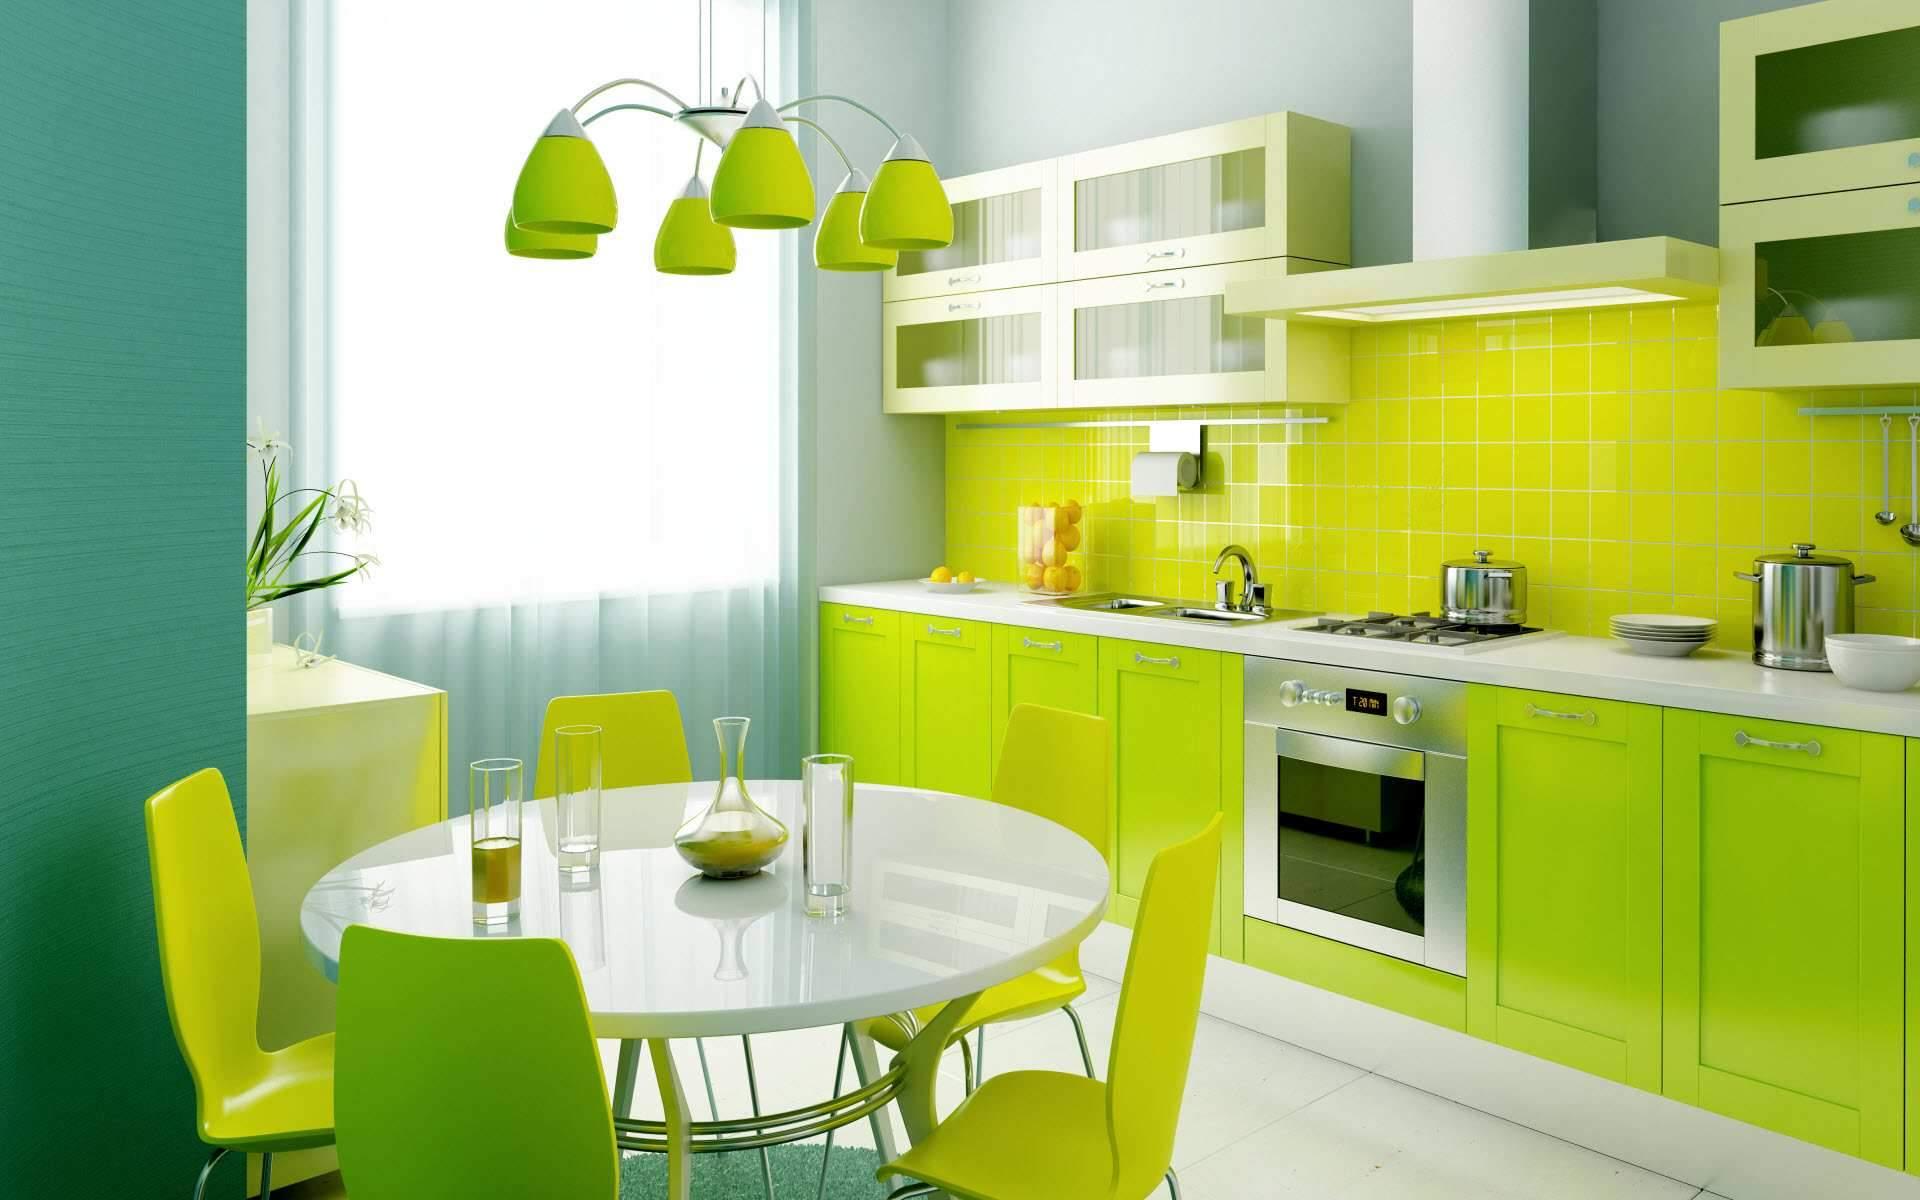 Home Designs Astounding Green Interior Design Australia Green Interior Design Ideas Together With Home Interior Design It Is A Simple Logic That Green Interior Design And For Elegant Home Fashion Simp Ndezines